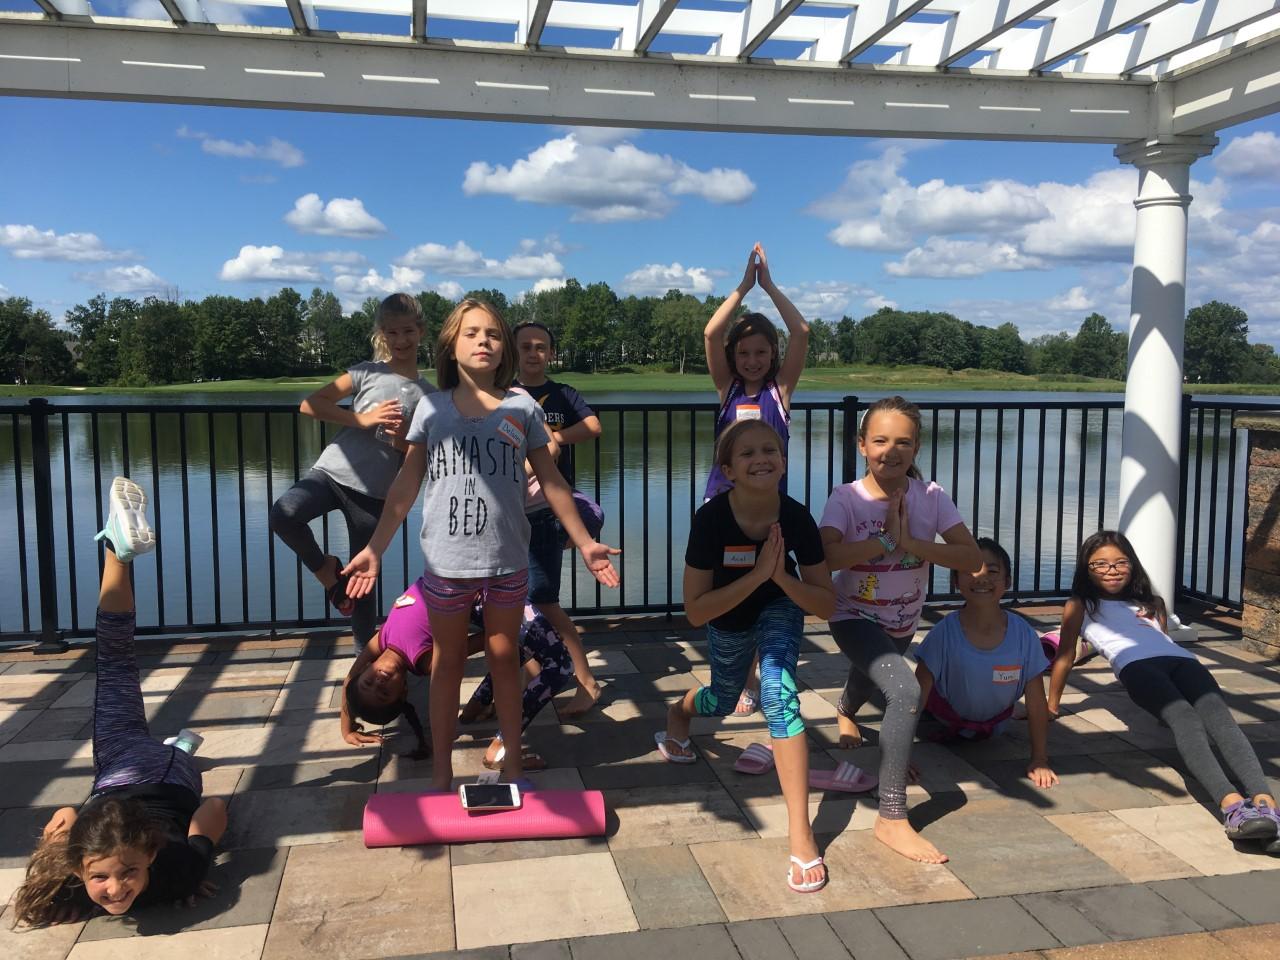 Birthday party yoga fun @ Forest Lake, Hudson, Aug 2019